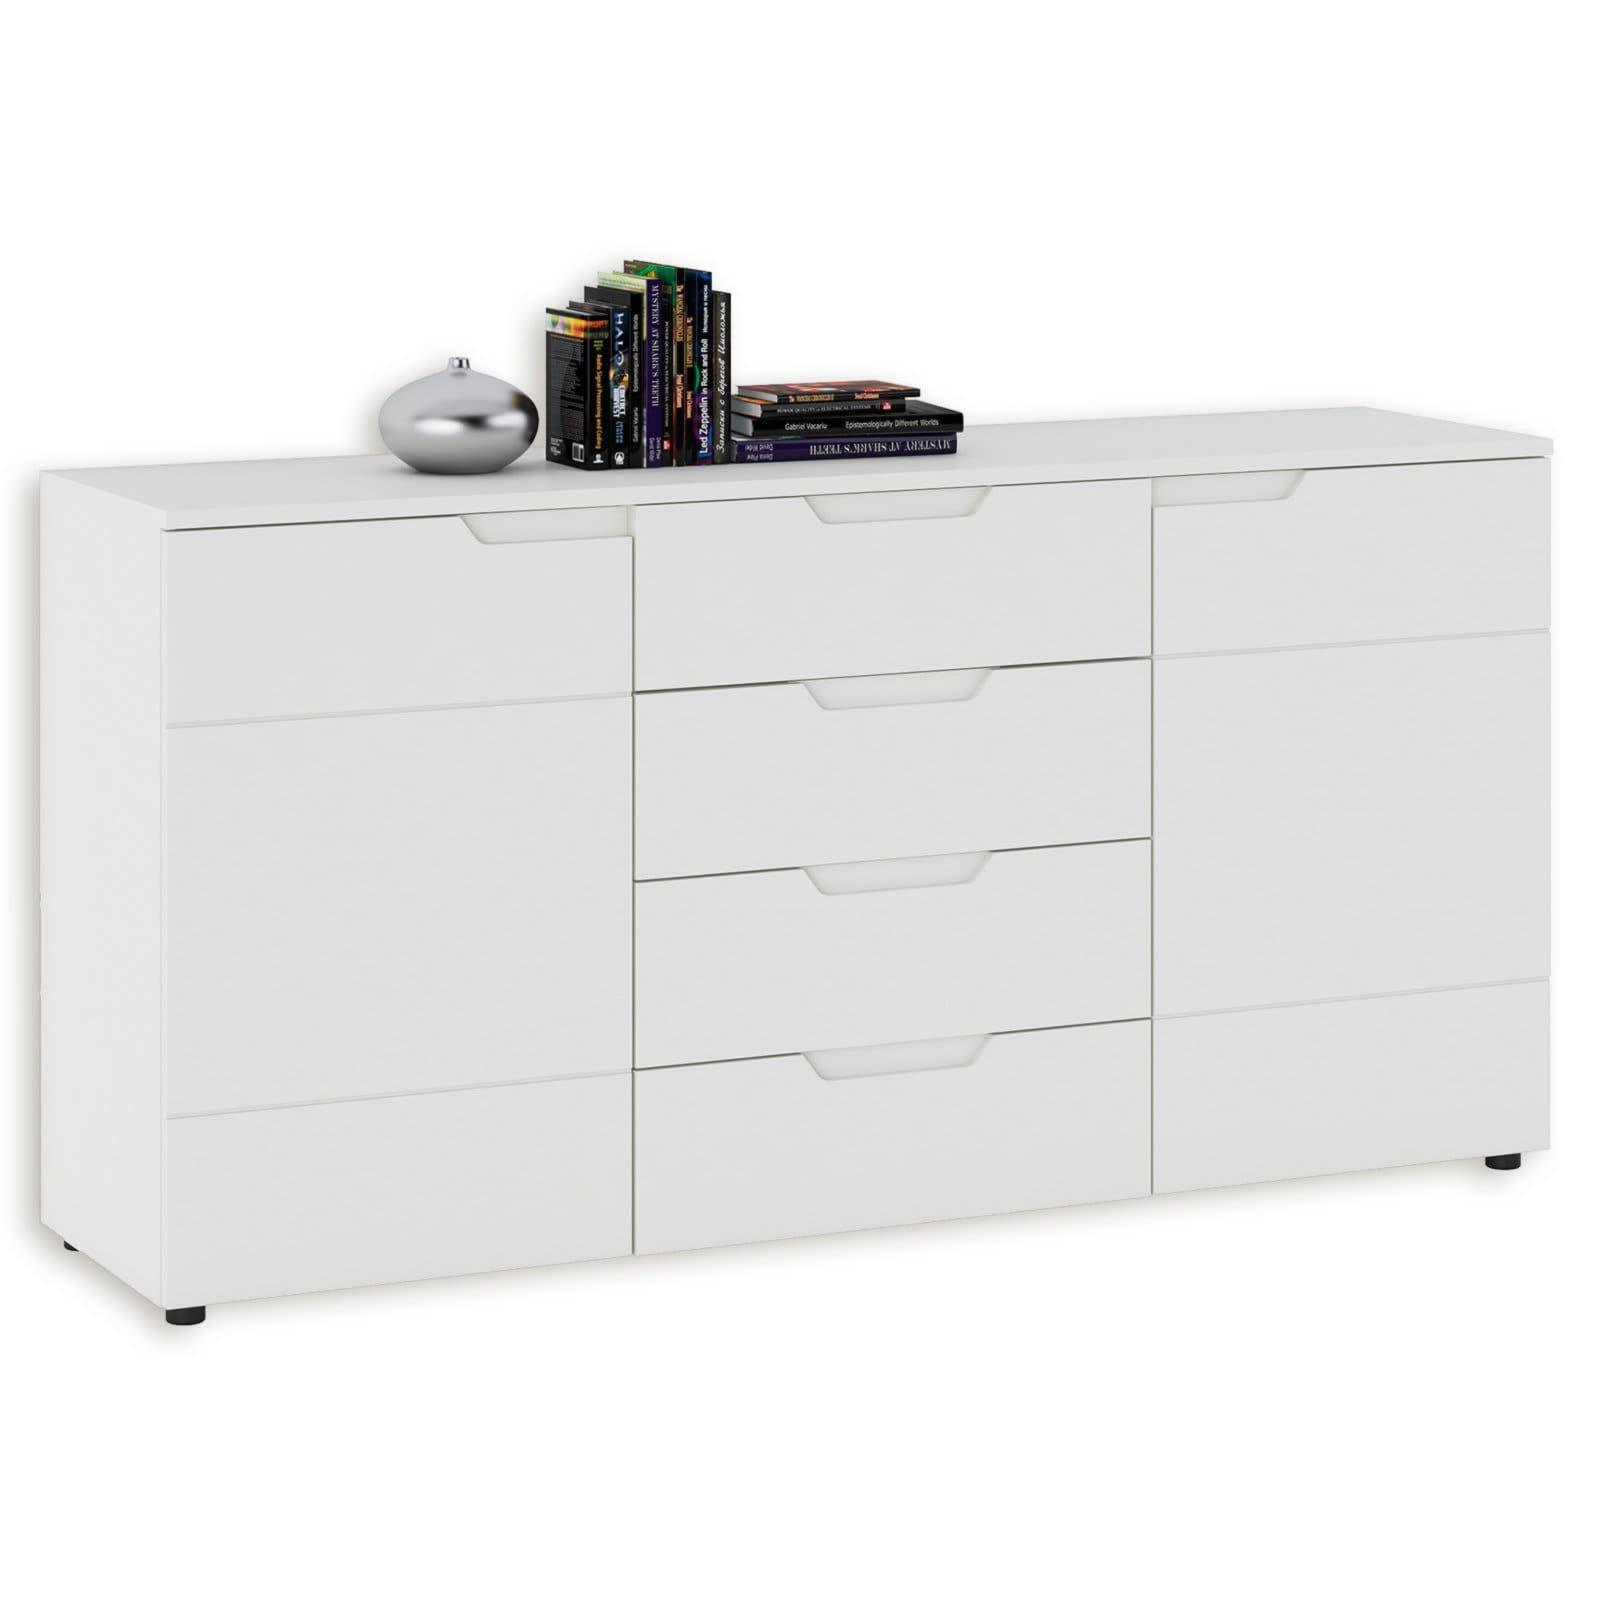 sideboard hilton wei hochglanz 4 schubk sten. Black Bedroom Furniture Sets. Home Design Ideas